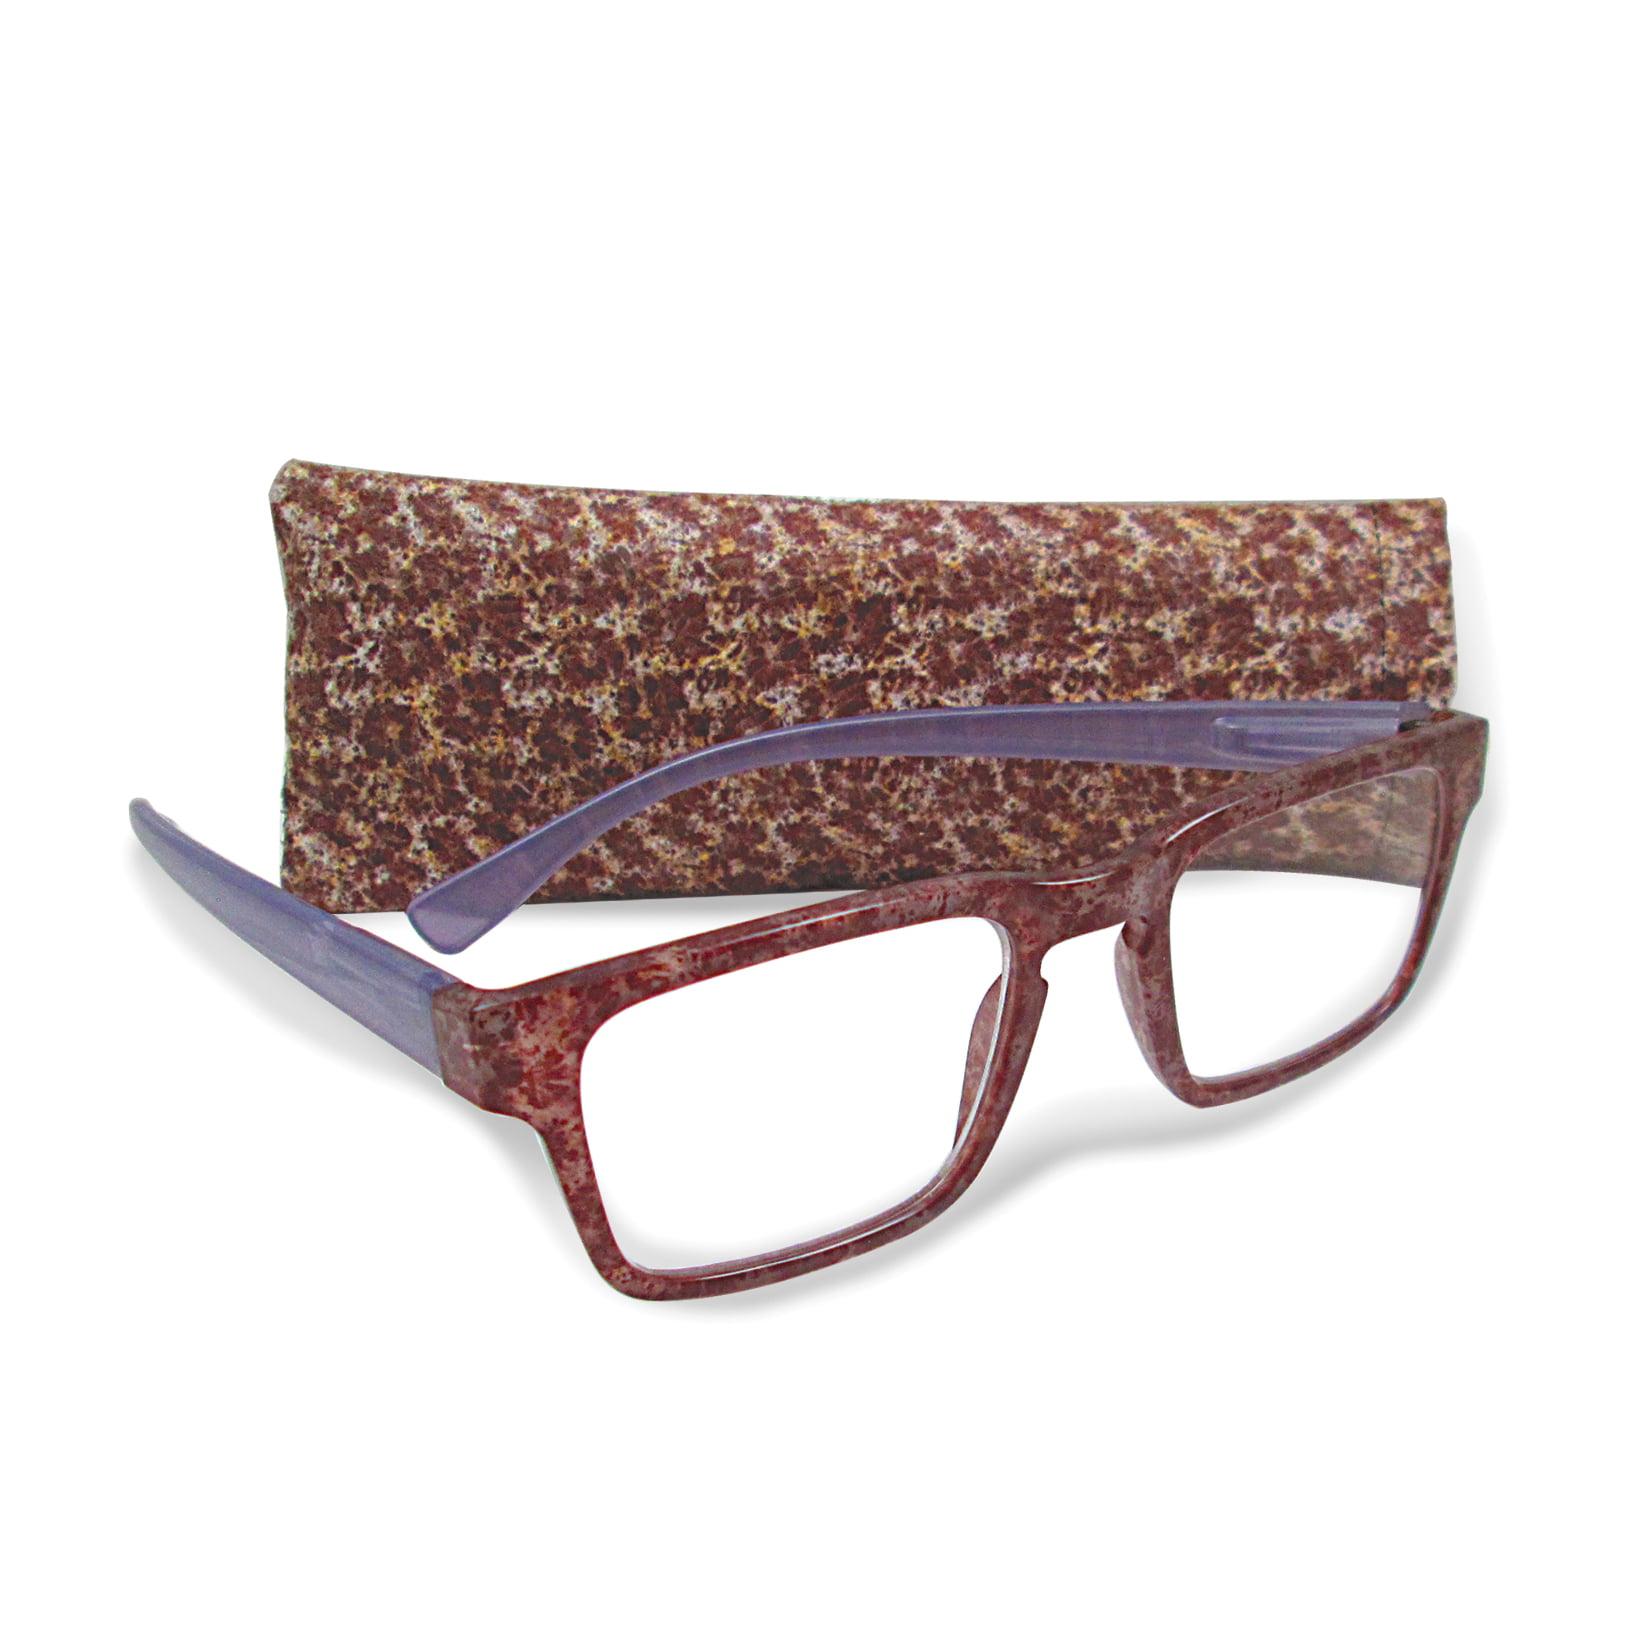 Lavender +2.75 Magnification Reading Glasses